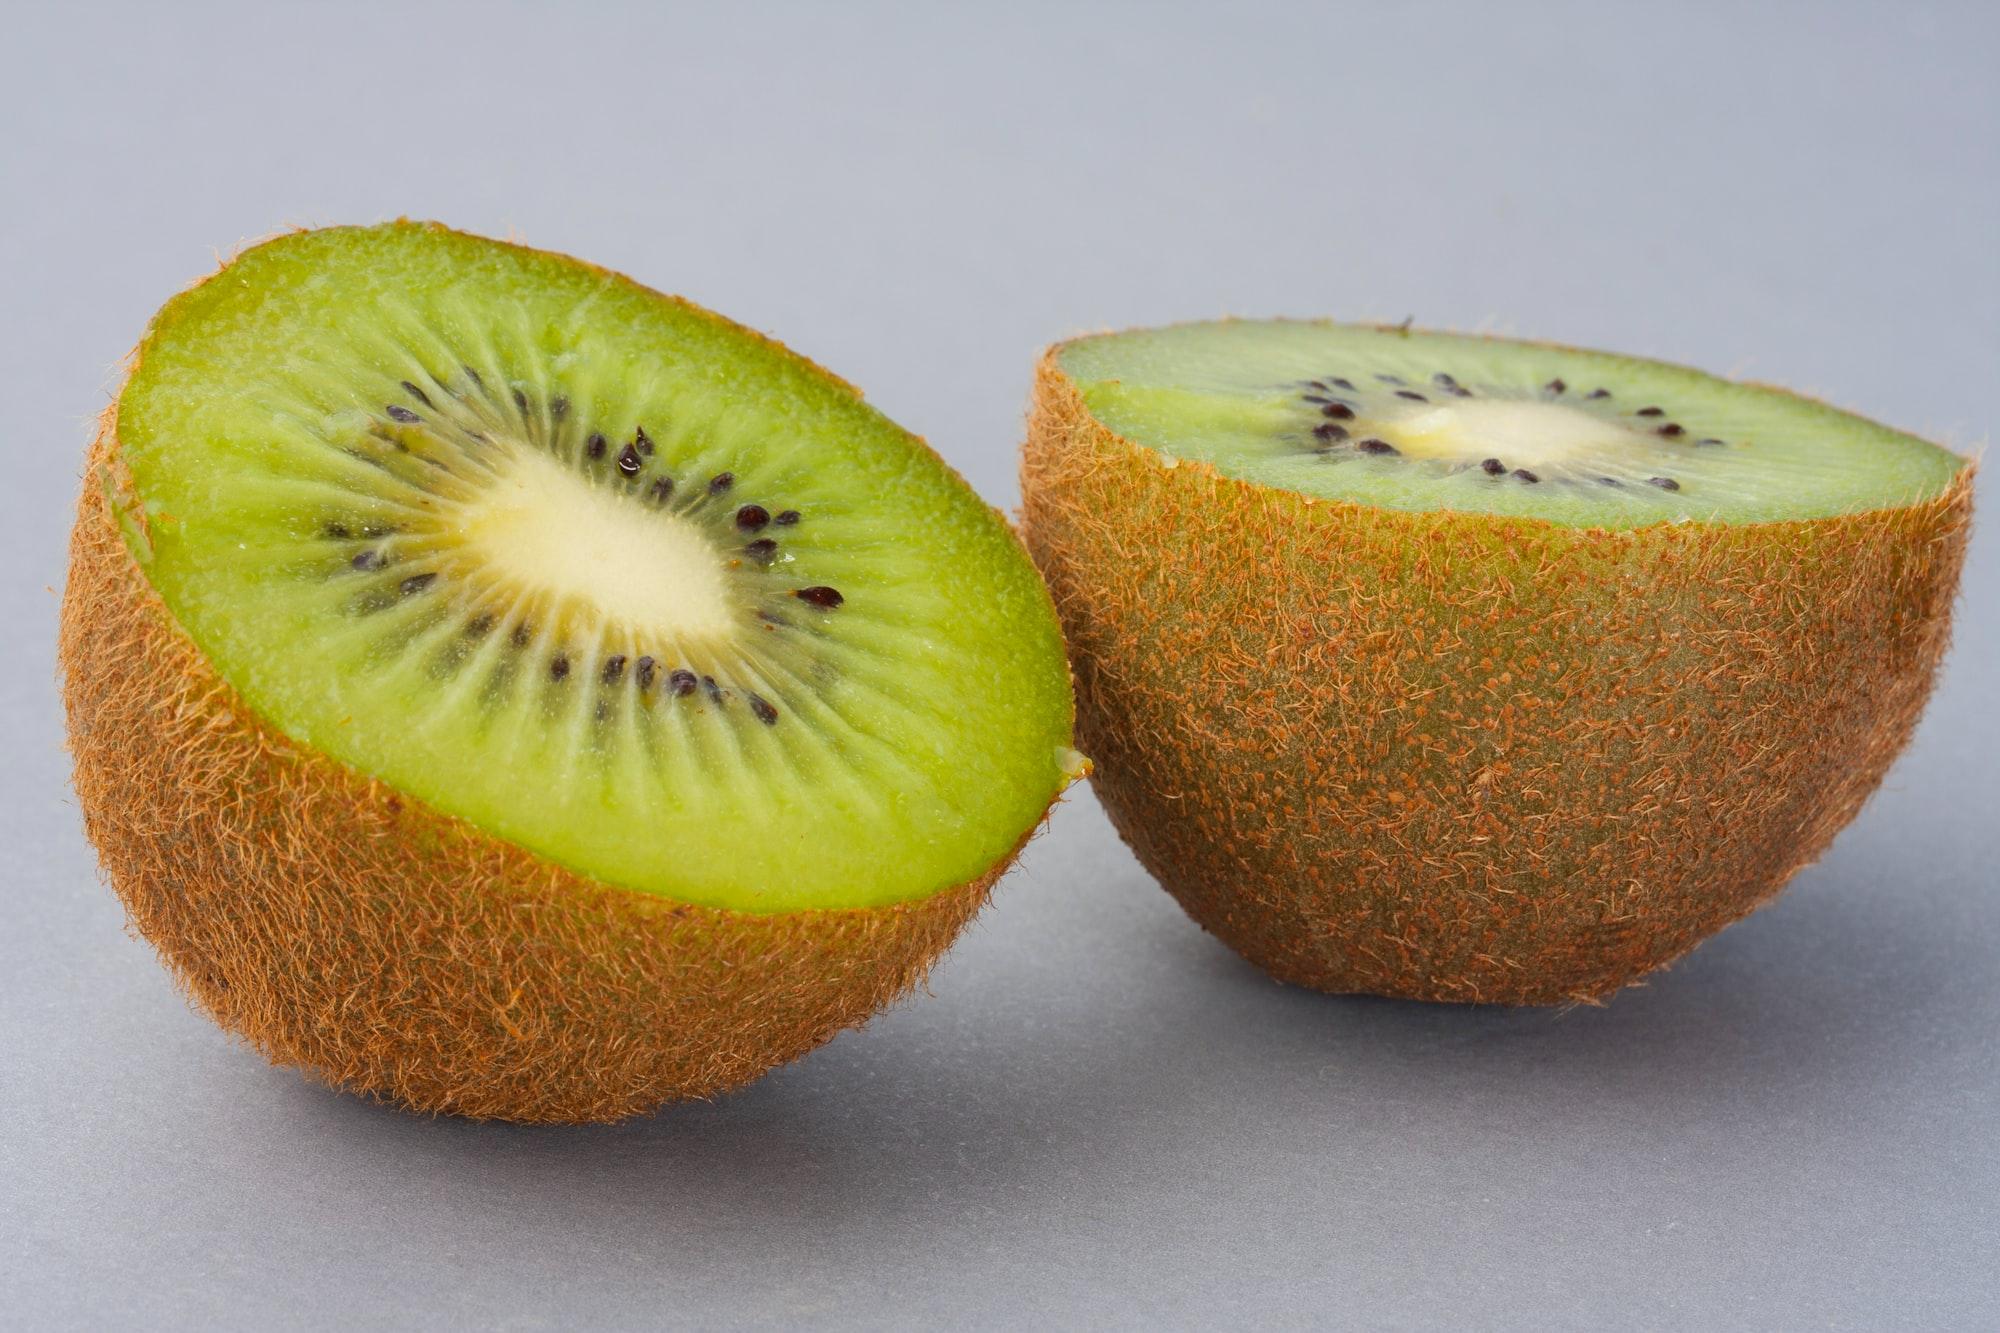 Fresh Kiwi Halves